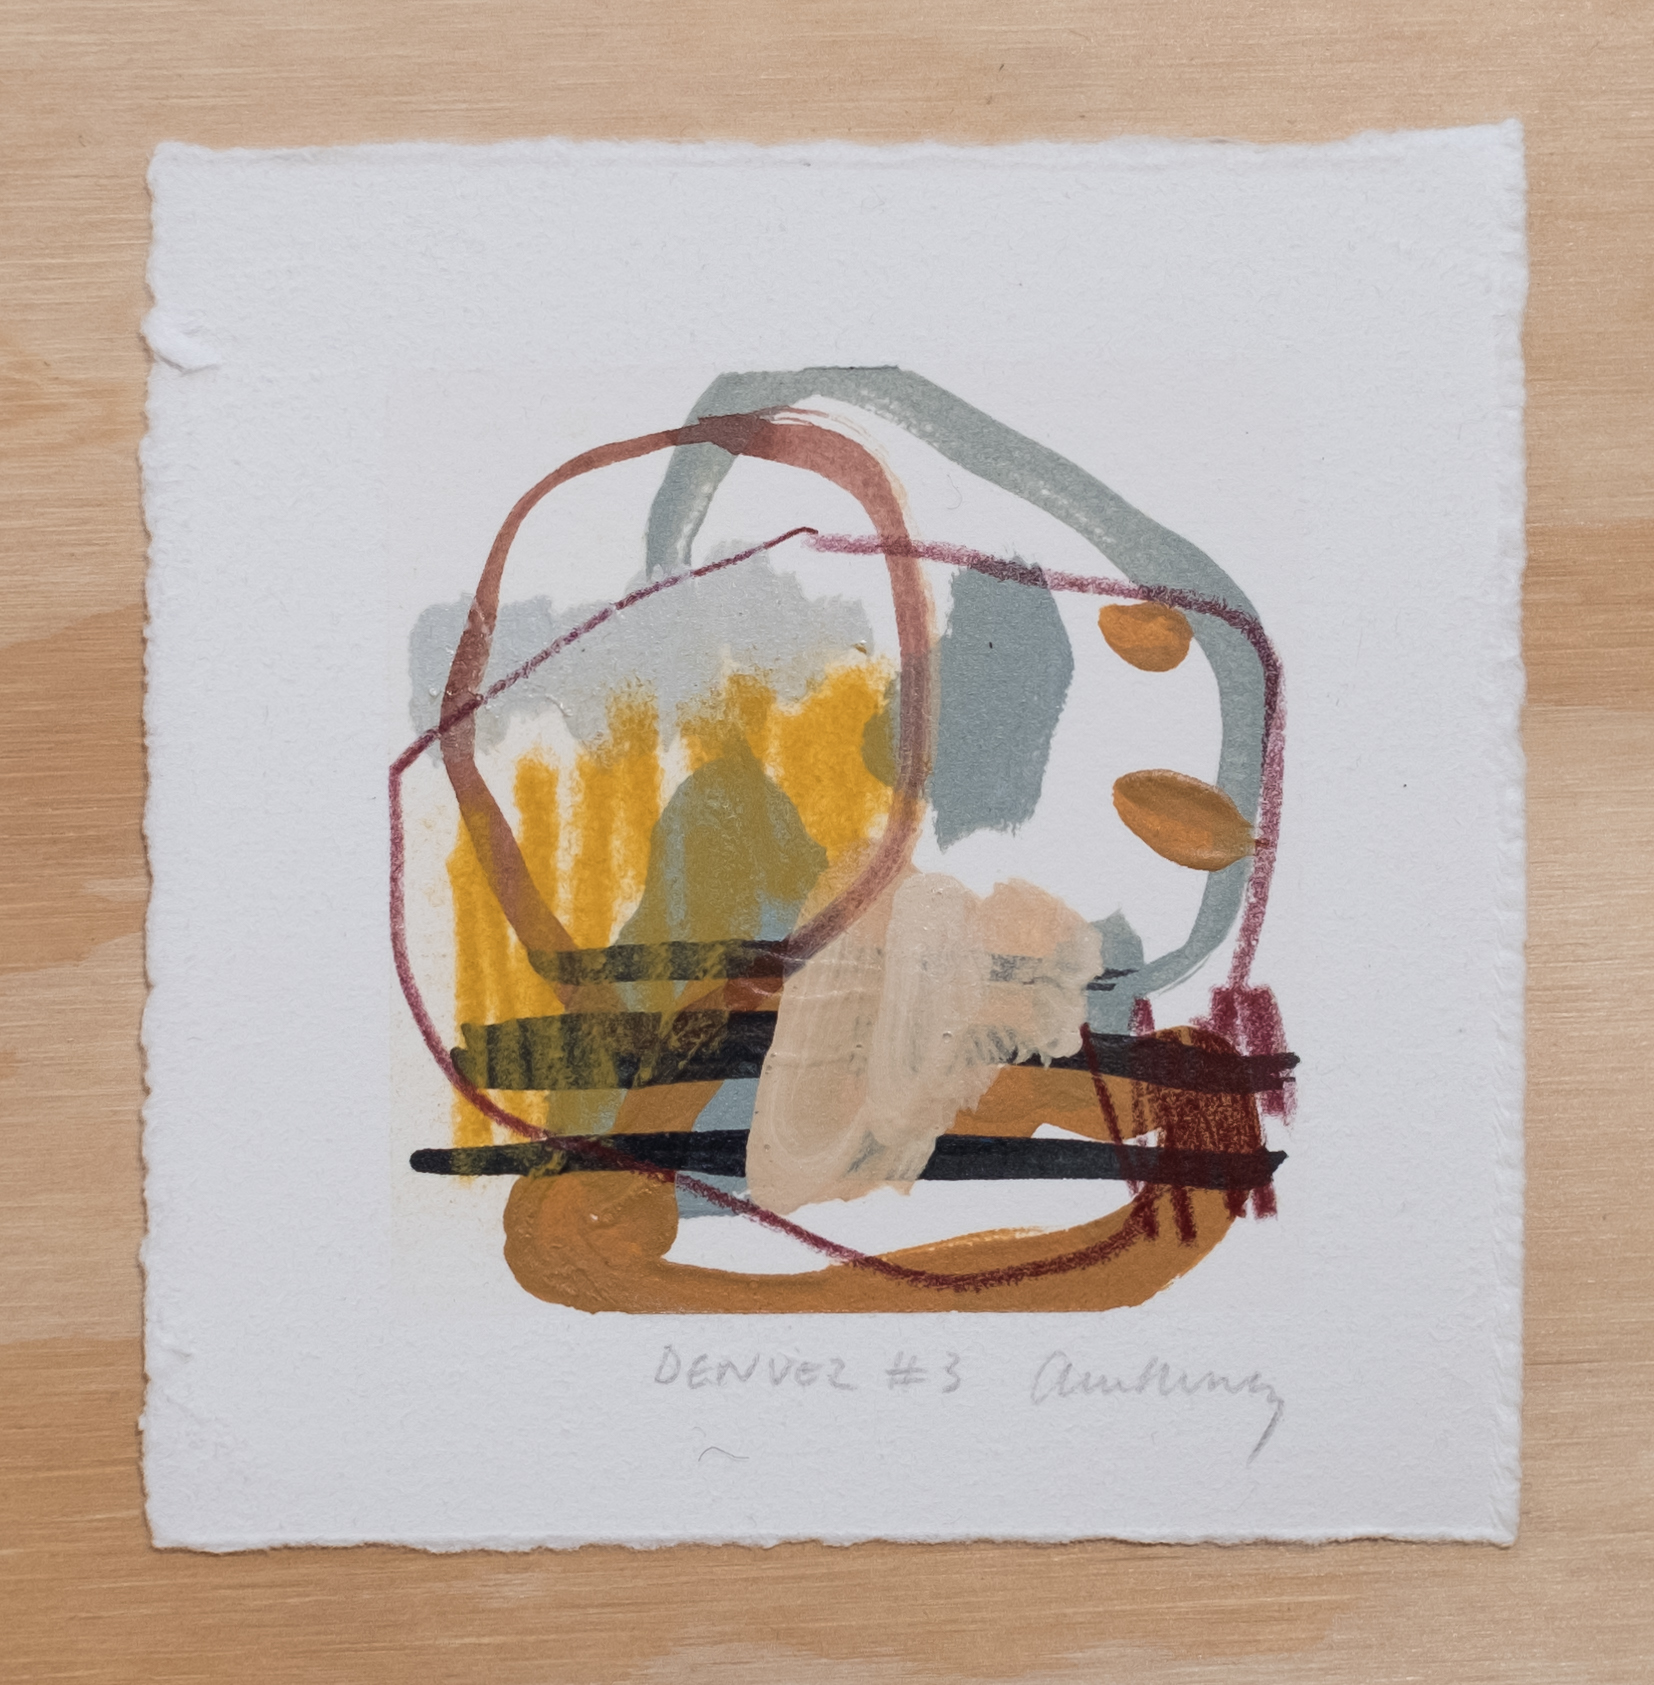 "Denver #3 / 4.5"" x 4.5"" / watercolor, acrylic paint and chalk pastel on cotton paper"